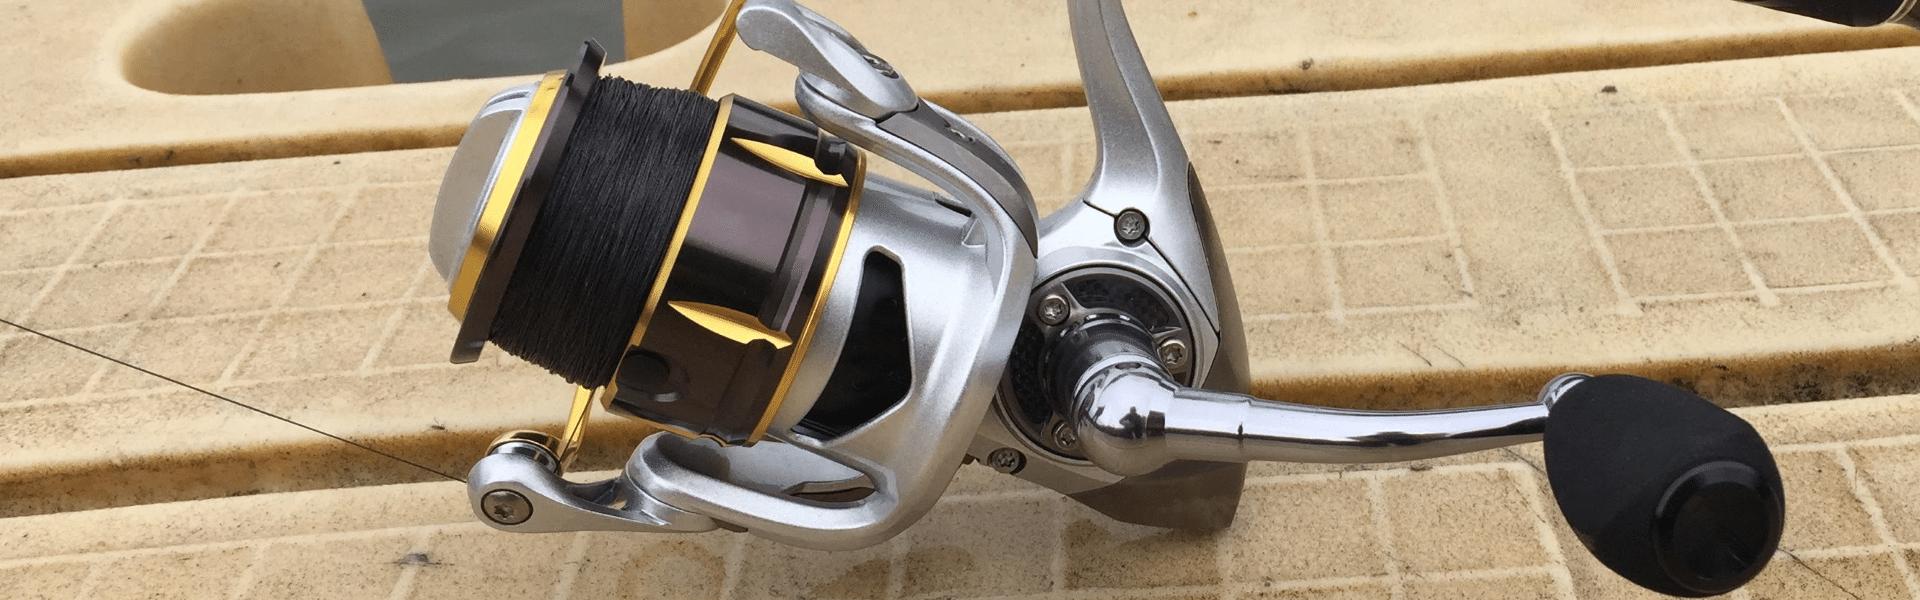 Best Spinning Reels Under $50 Reviewed in Detail